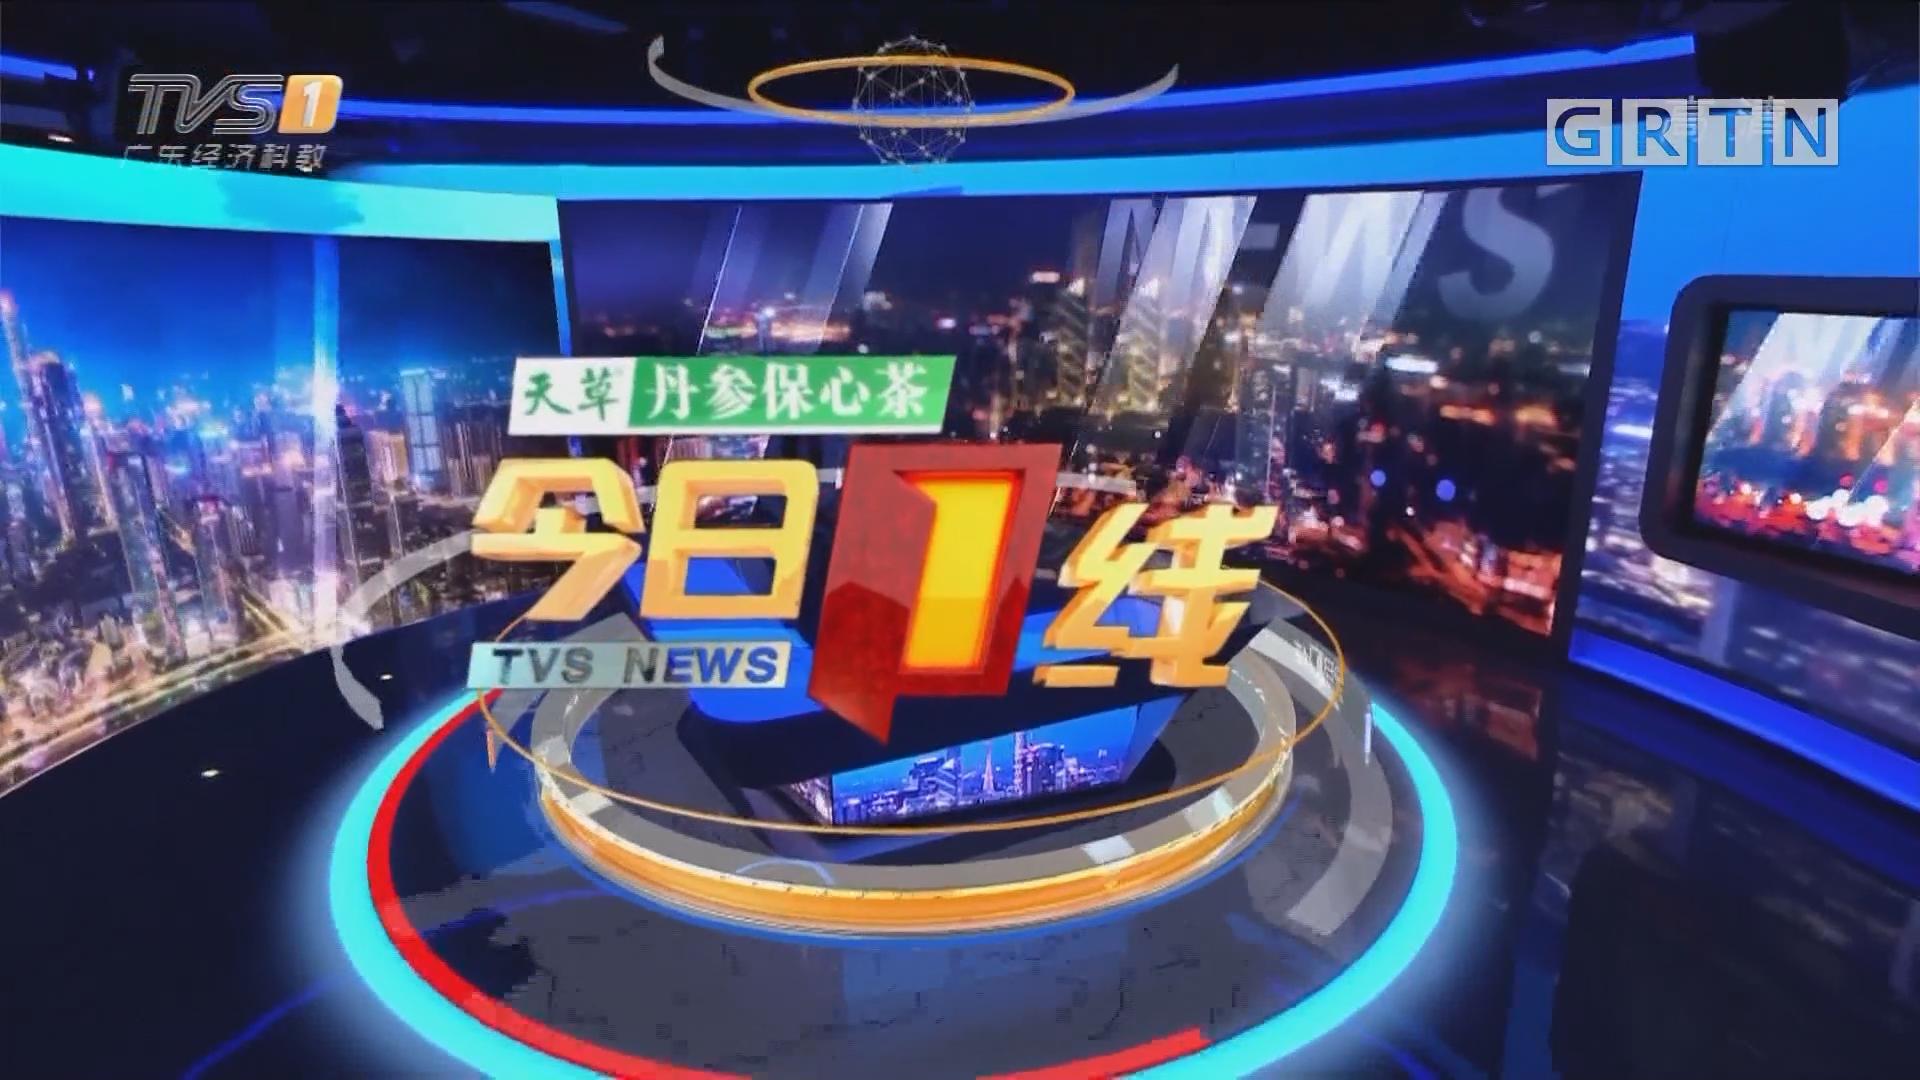 [HD][2019-04-19]今日一线:暴雨来袭:广州首发暴雨红色预警 多路段水浸